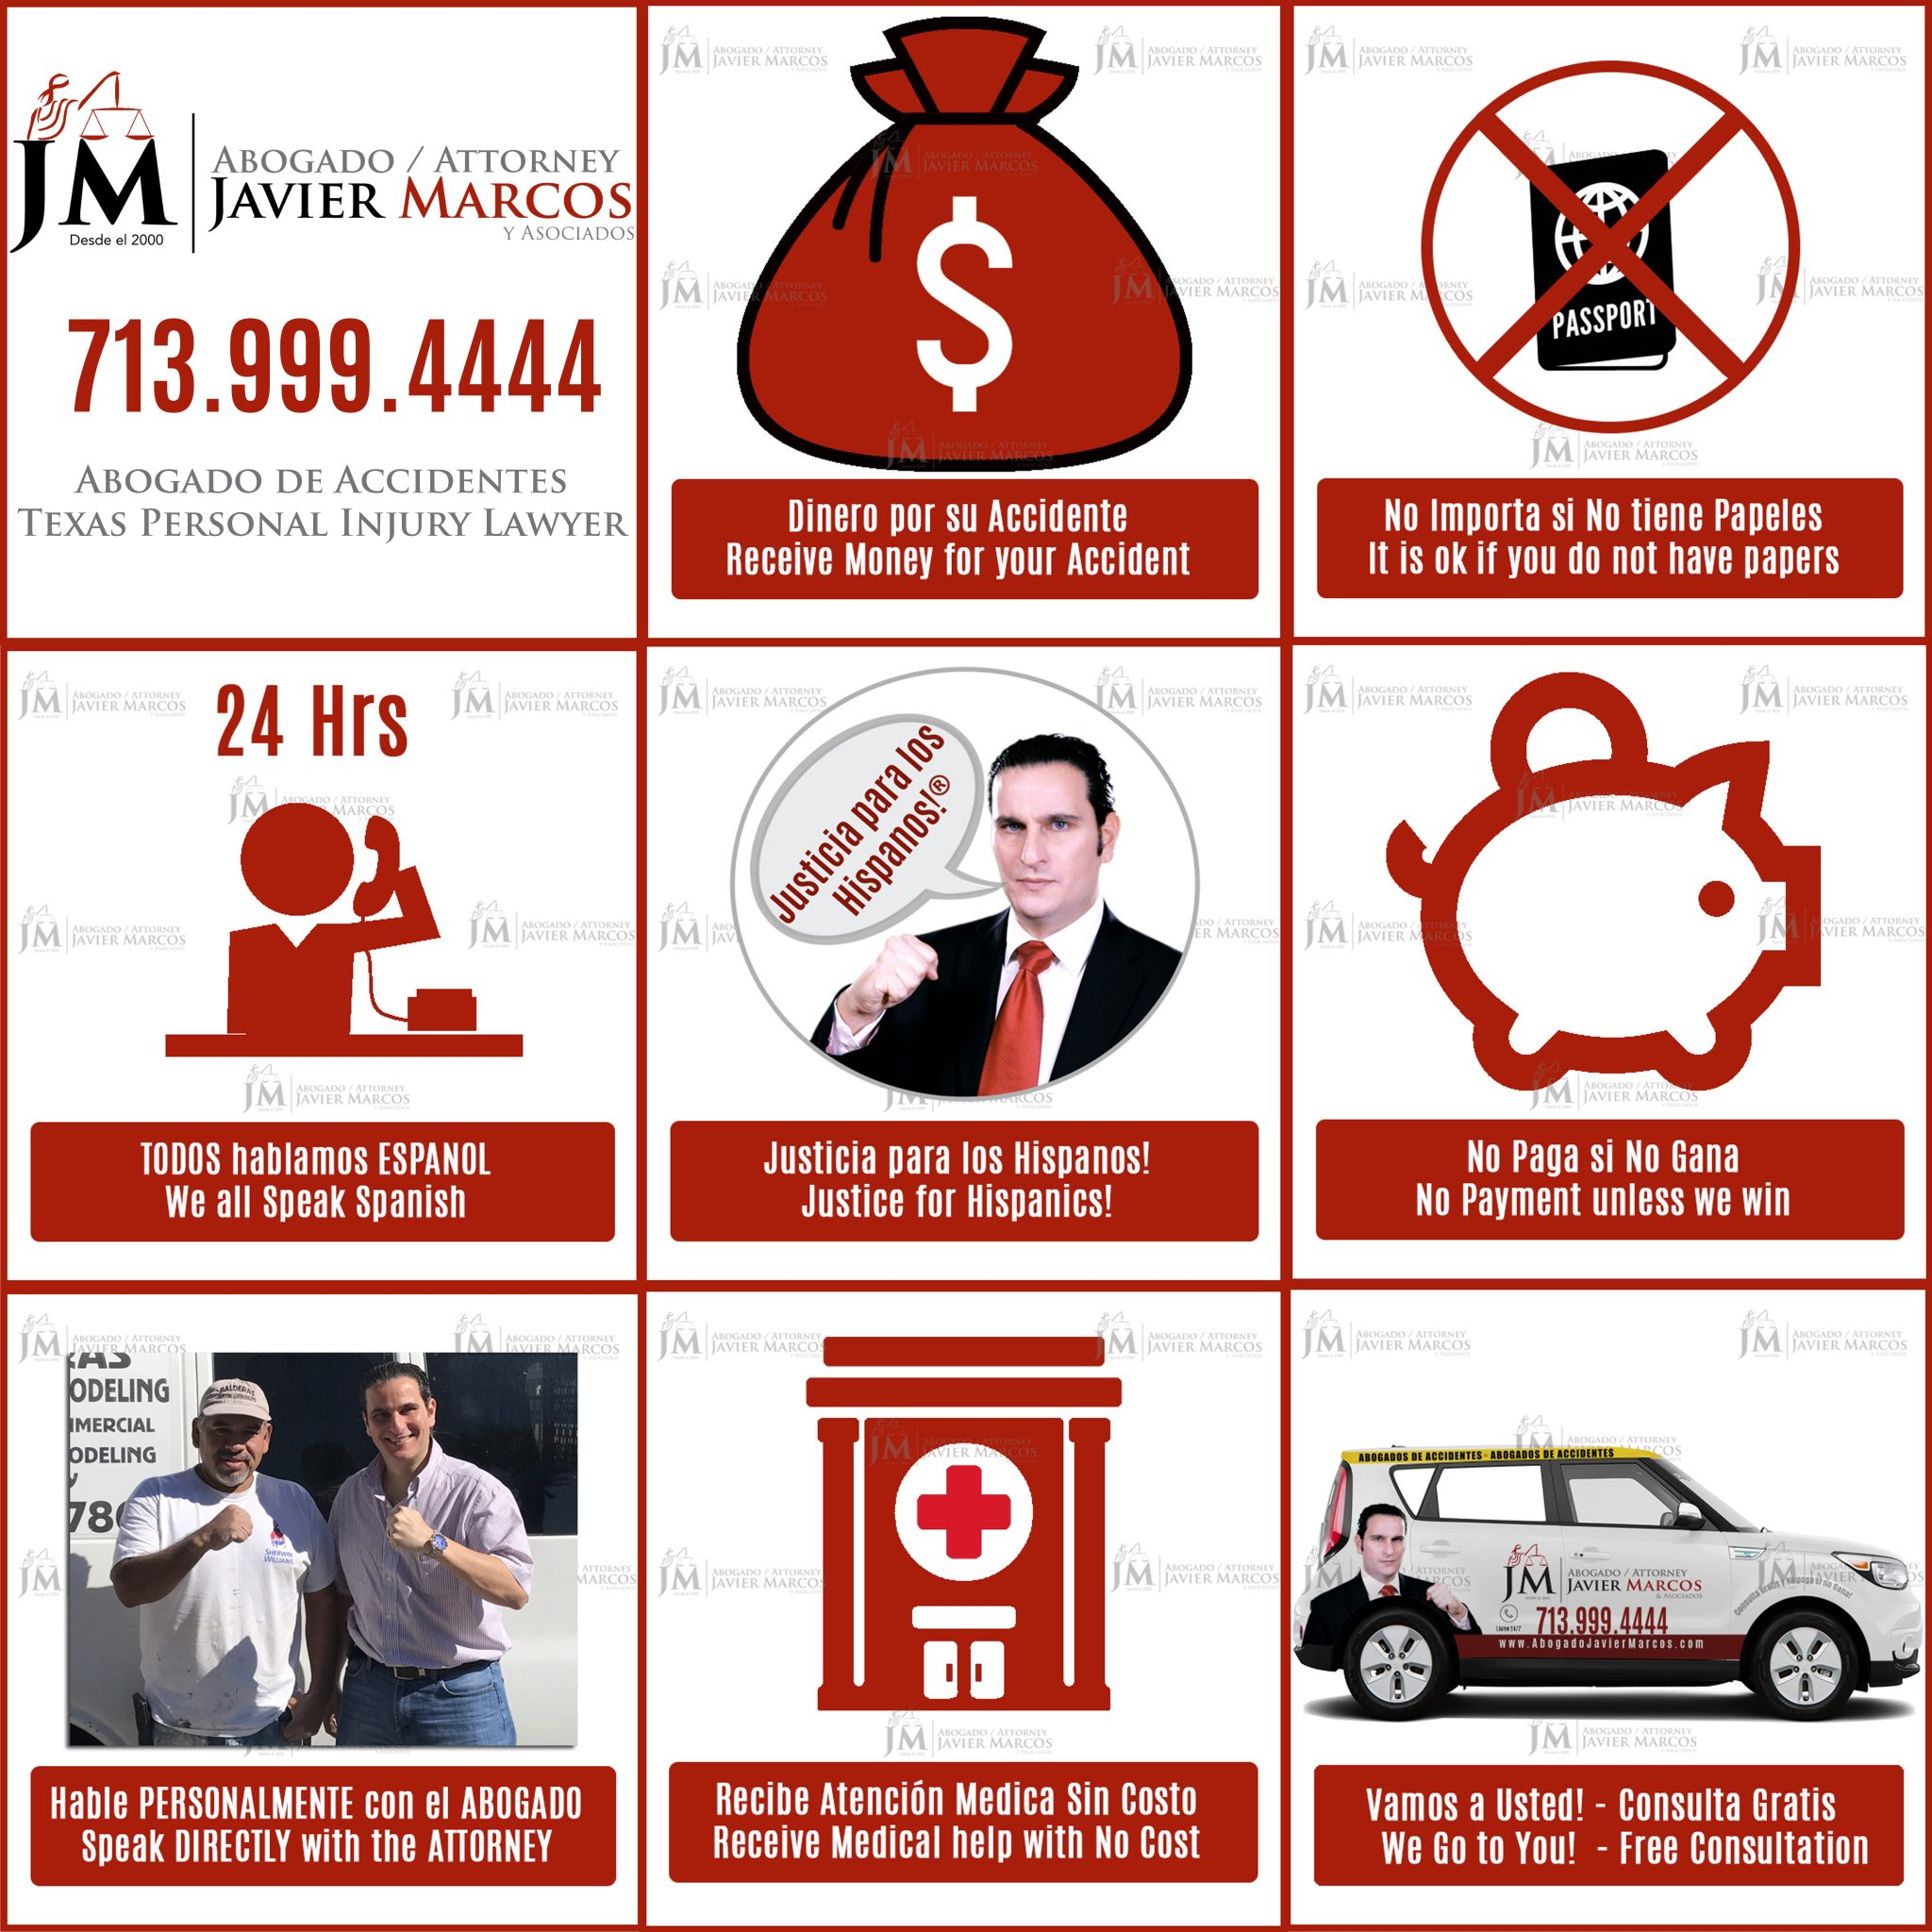 Abogado Javier Marcos - Abogado de Accidentes